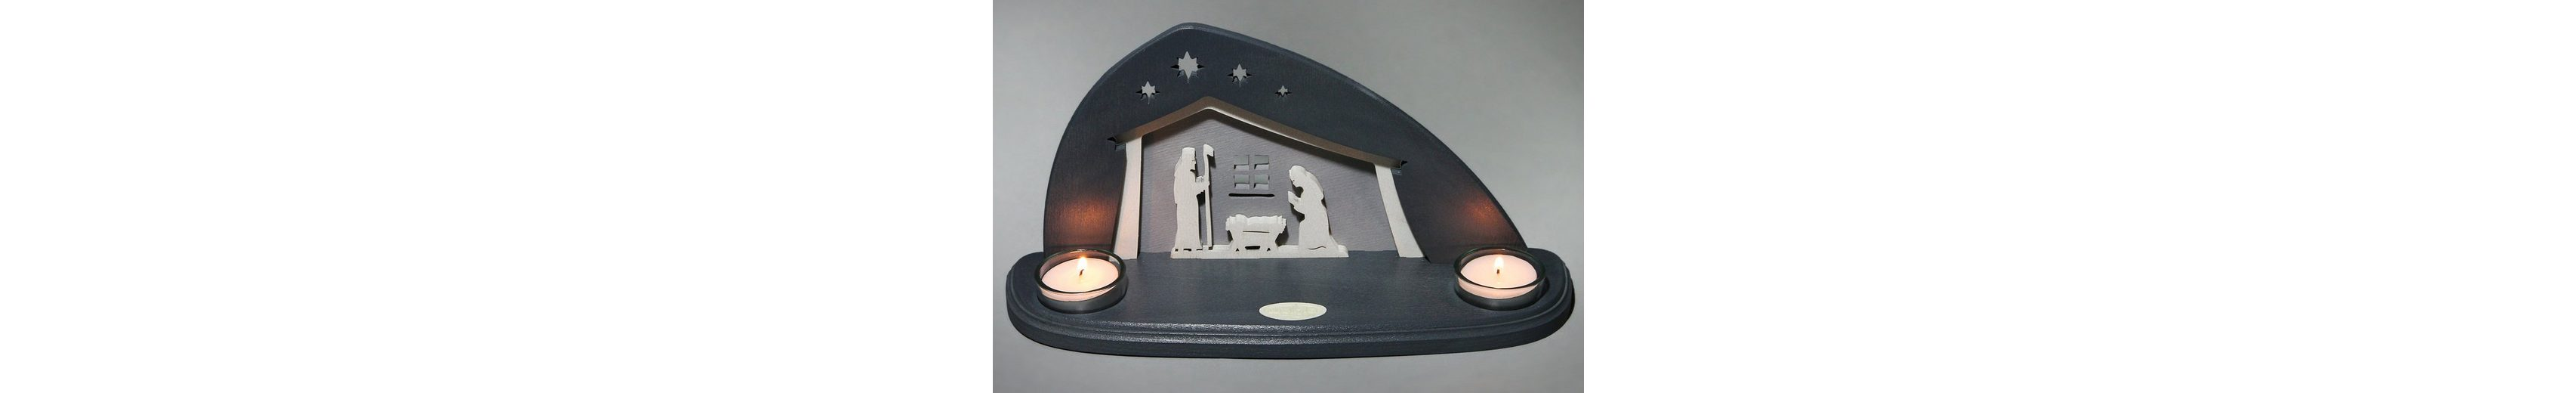 Weigla® Teelichthalter, »Bethlehem«